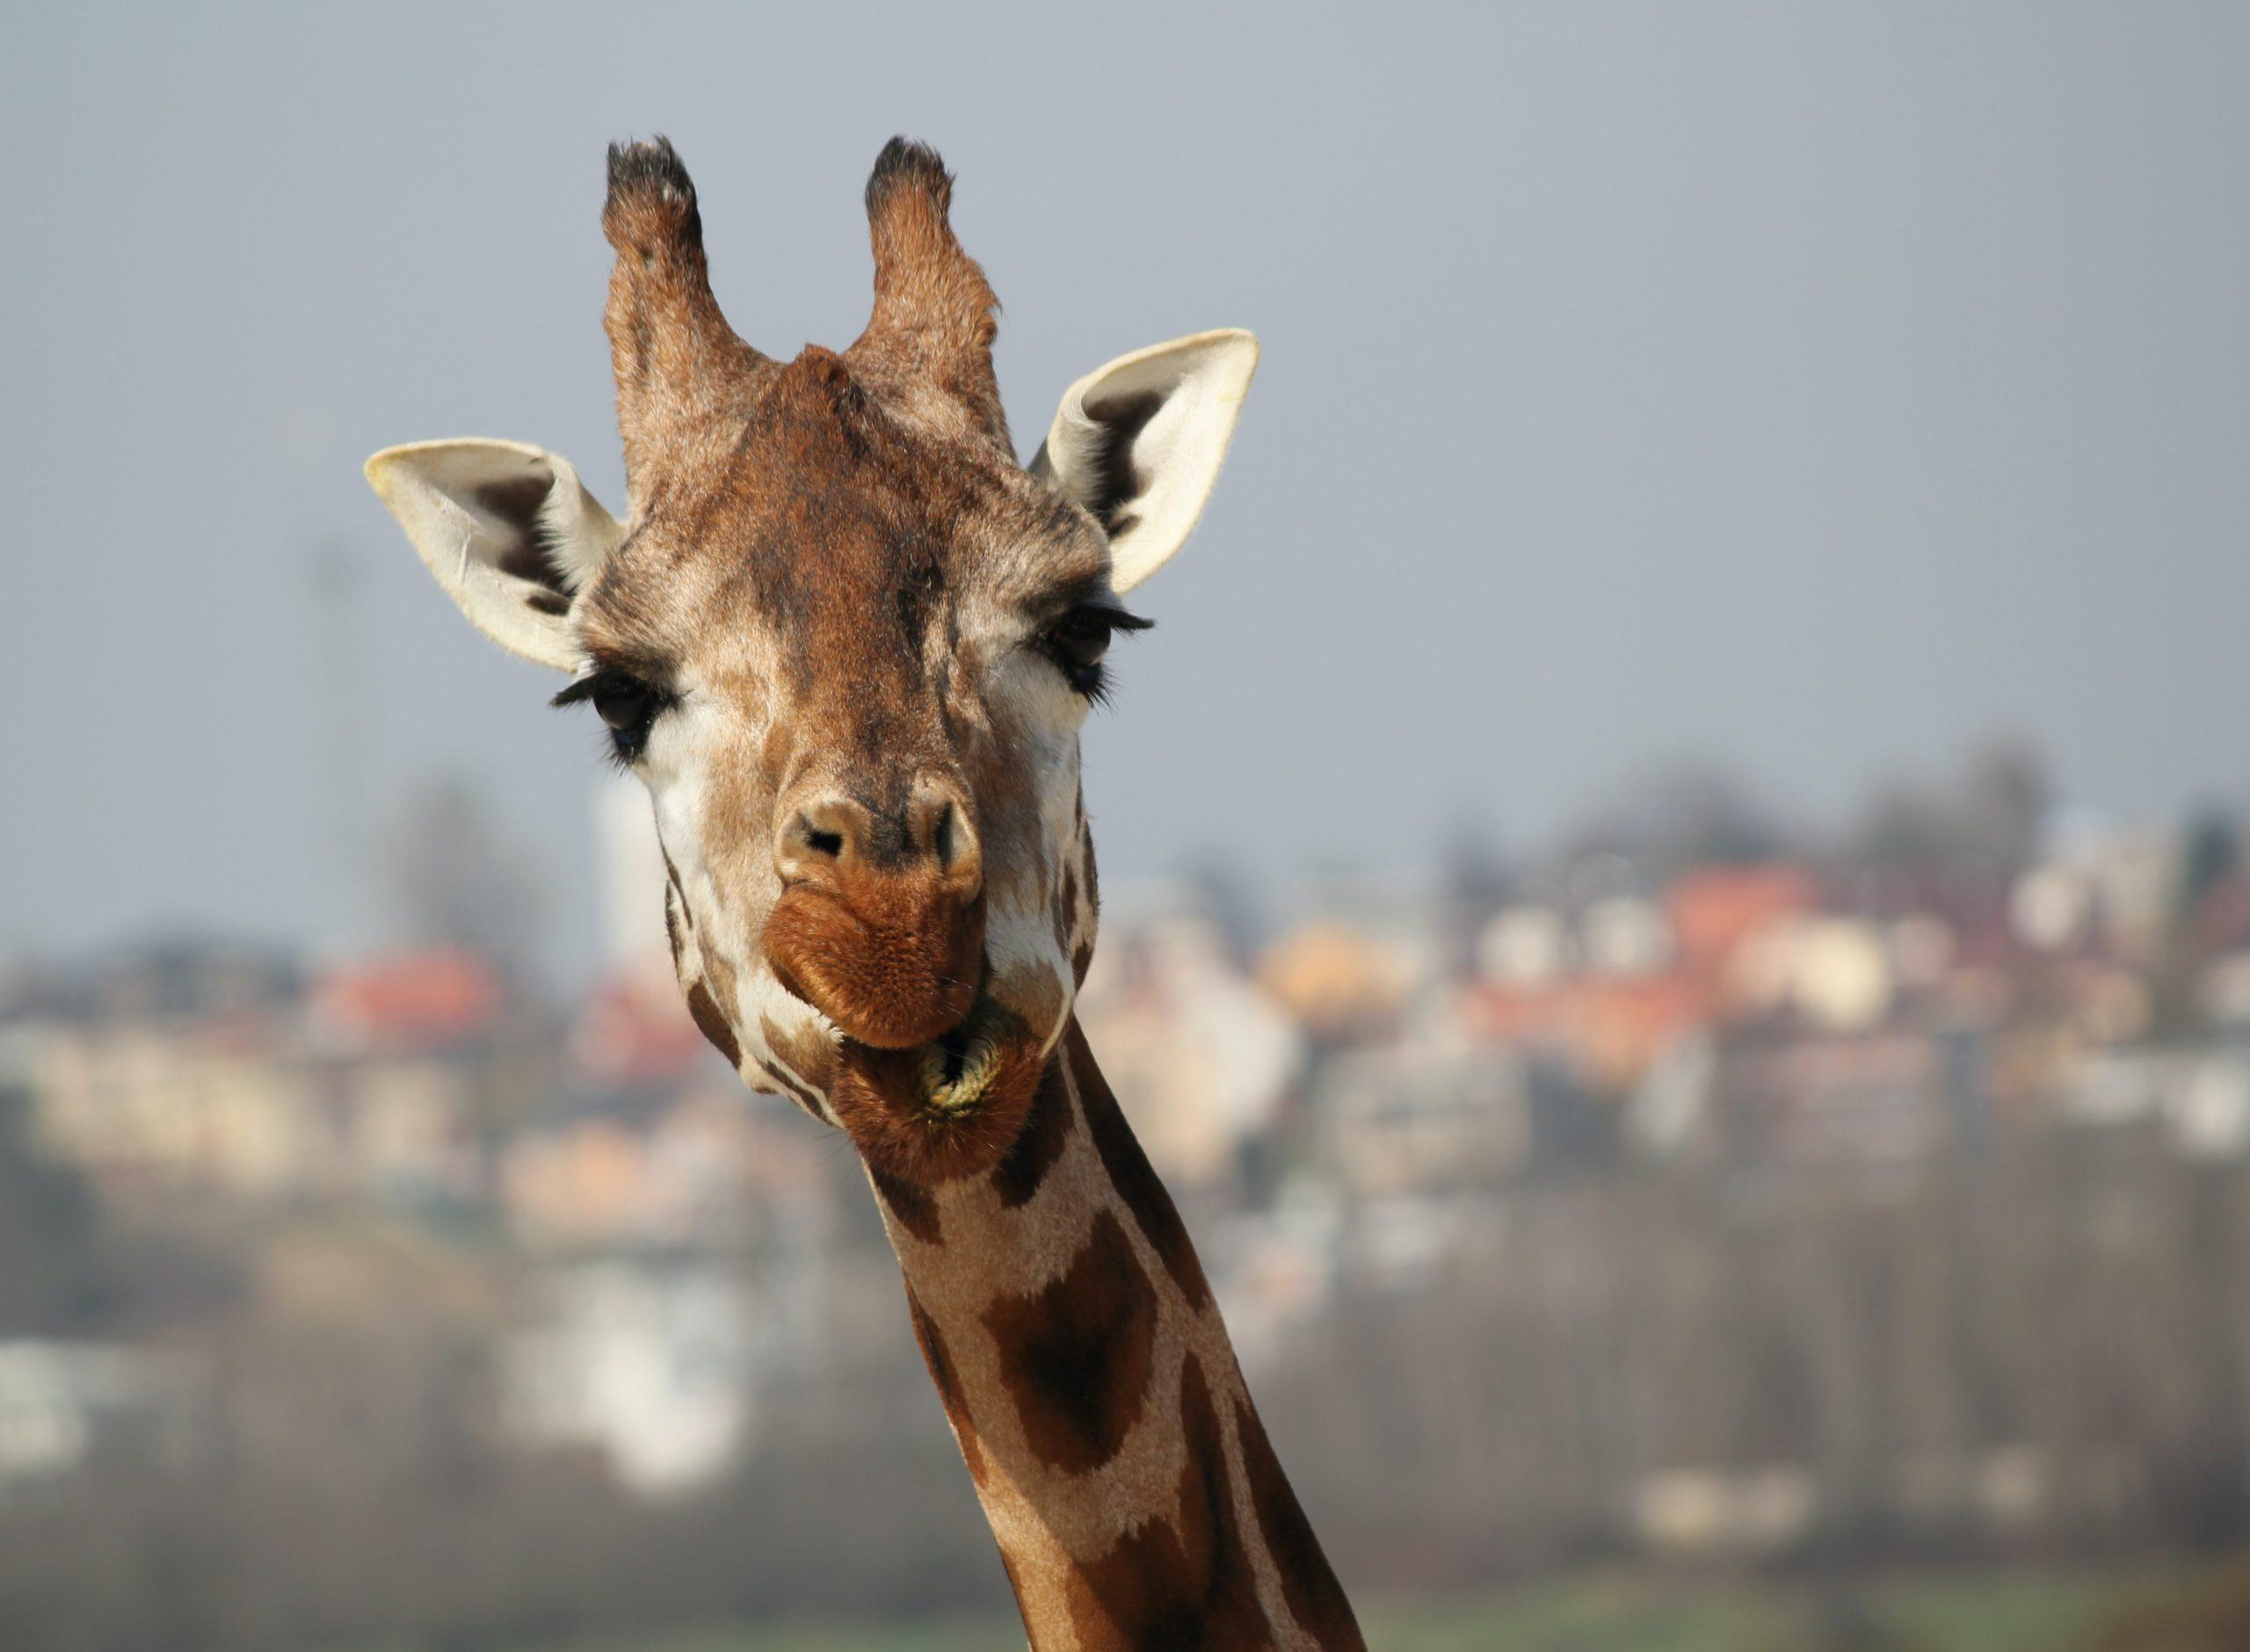 A closeup of a brown giraffe.